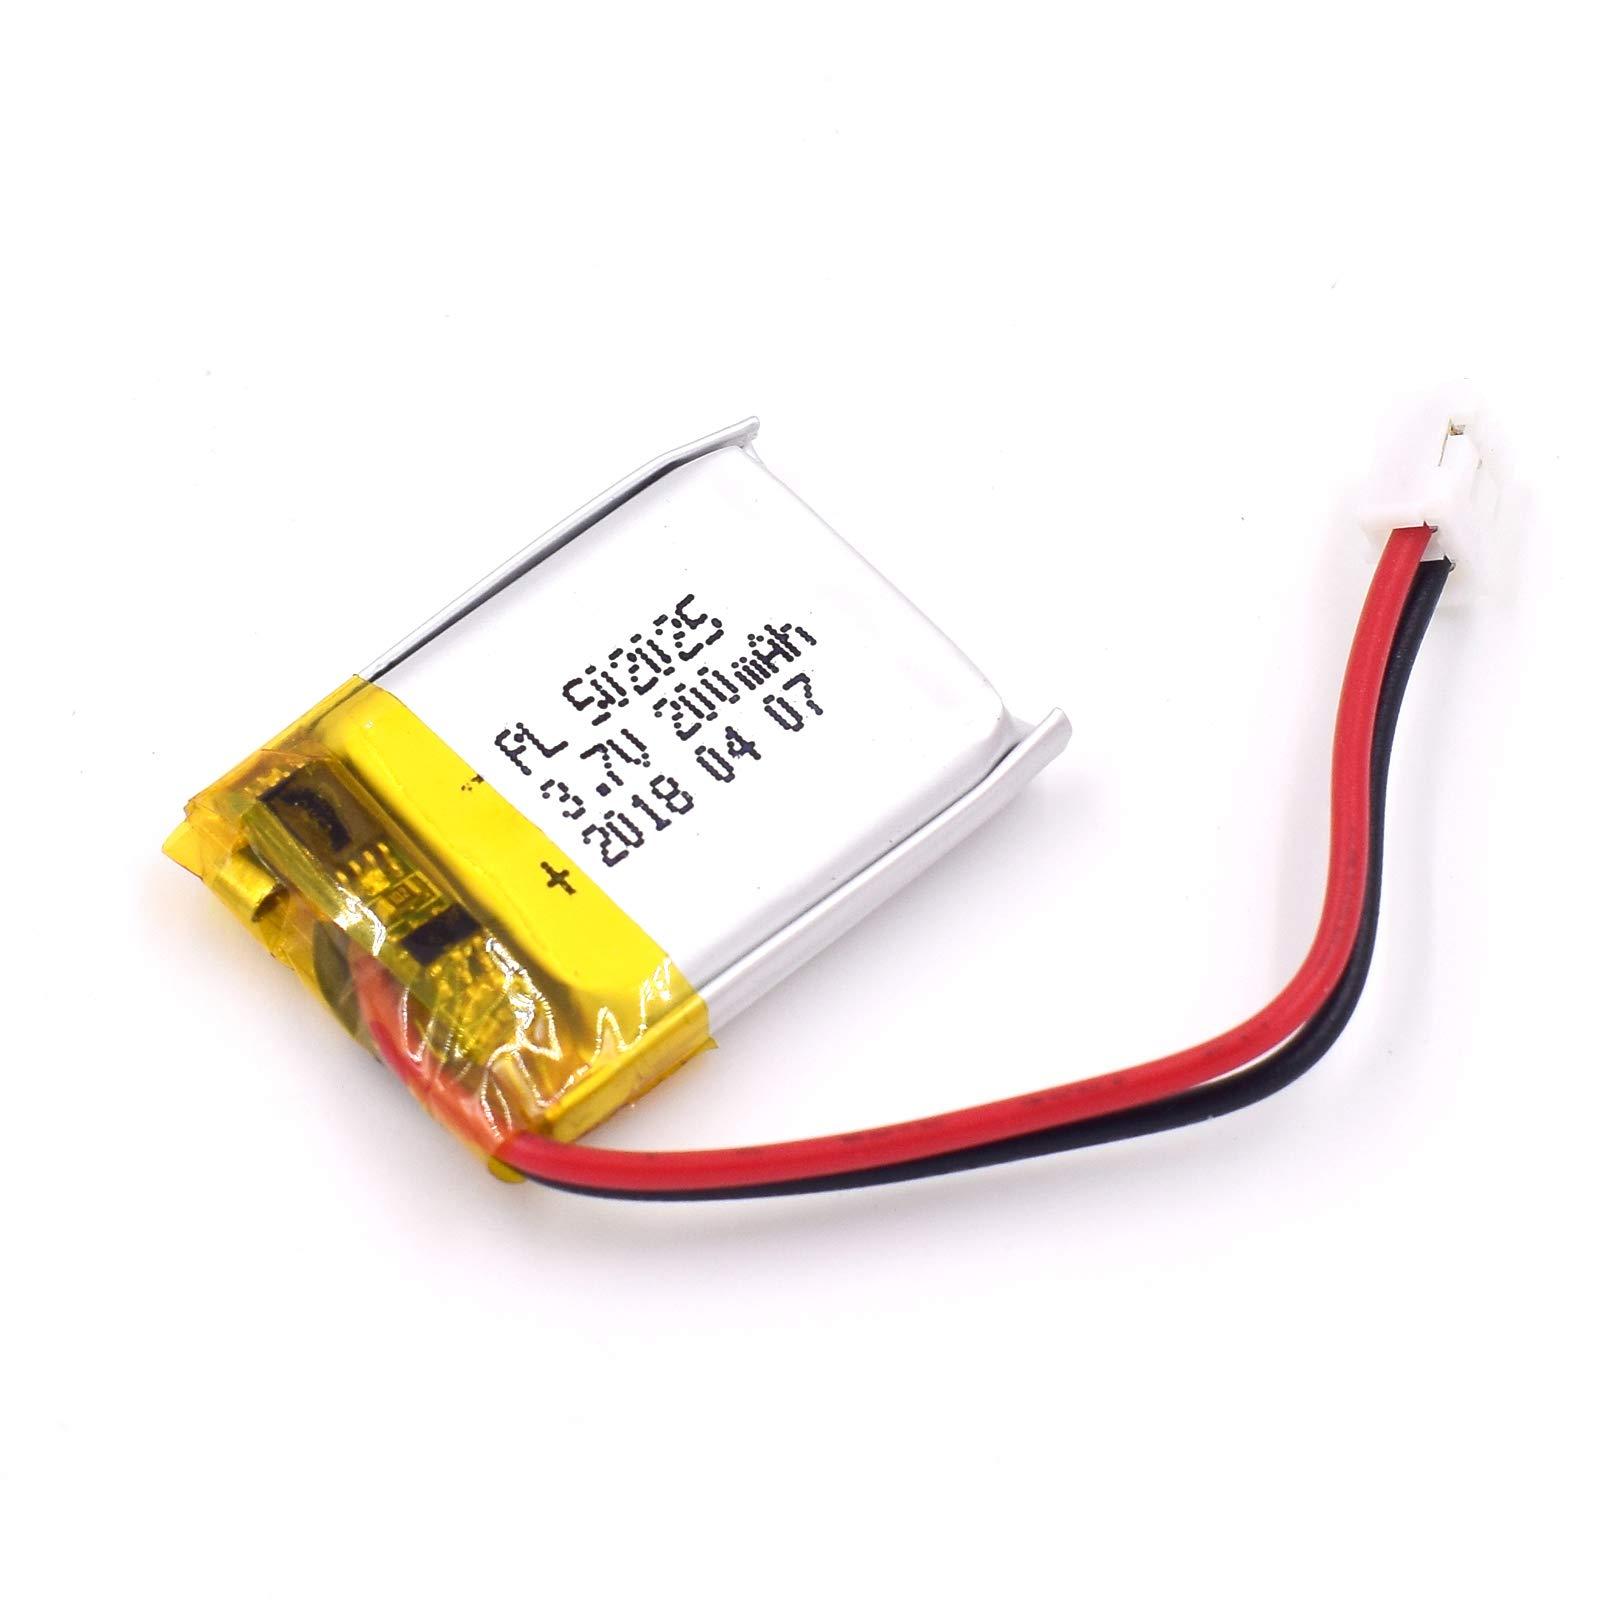 Bateria Lipo 3.7V 200mAh 502025 Recargable JST Conector